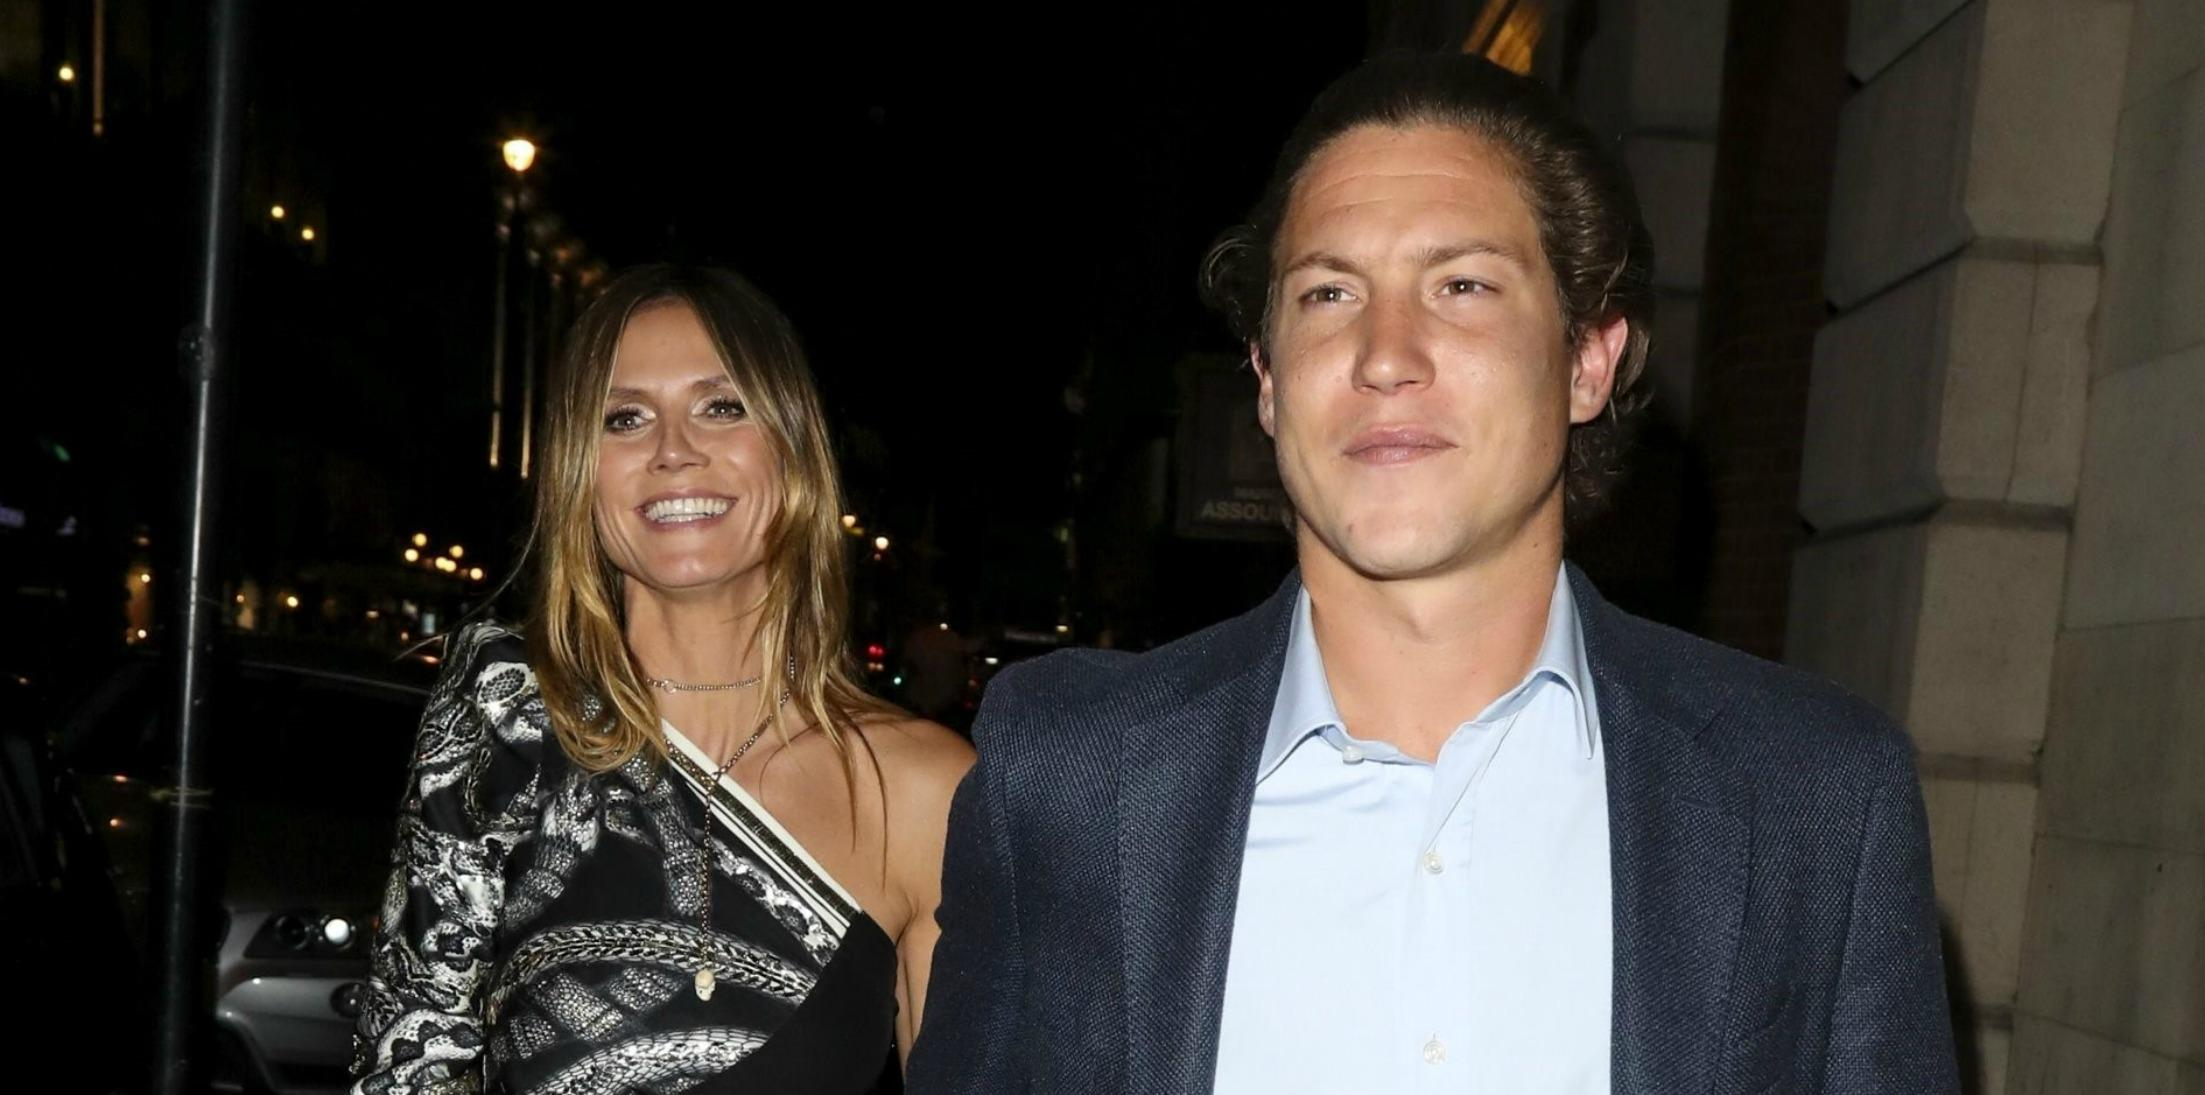 Heidi Klum Boyfriend Vito Schnabel Cheating Photos Long